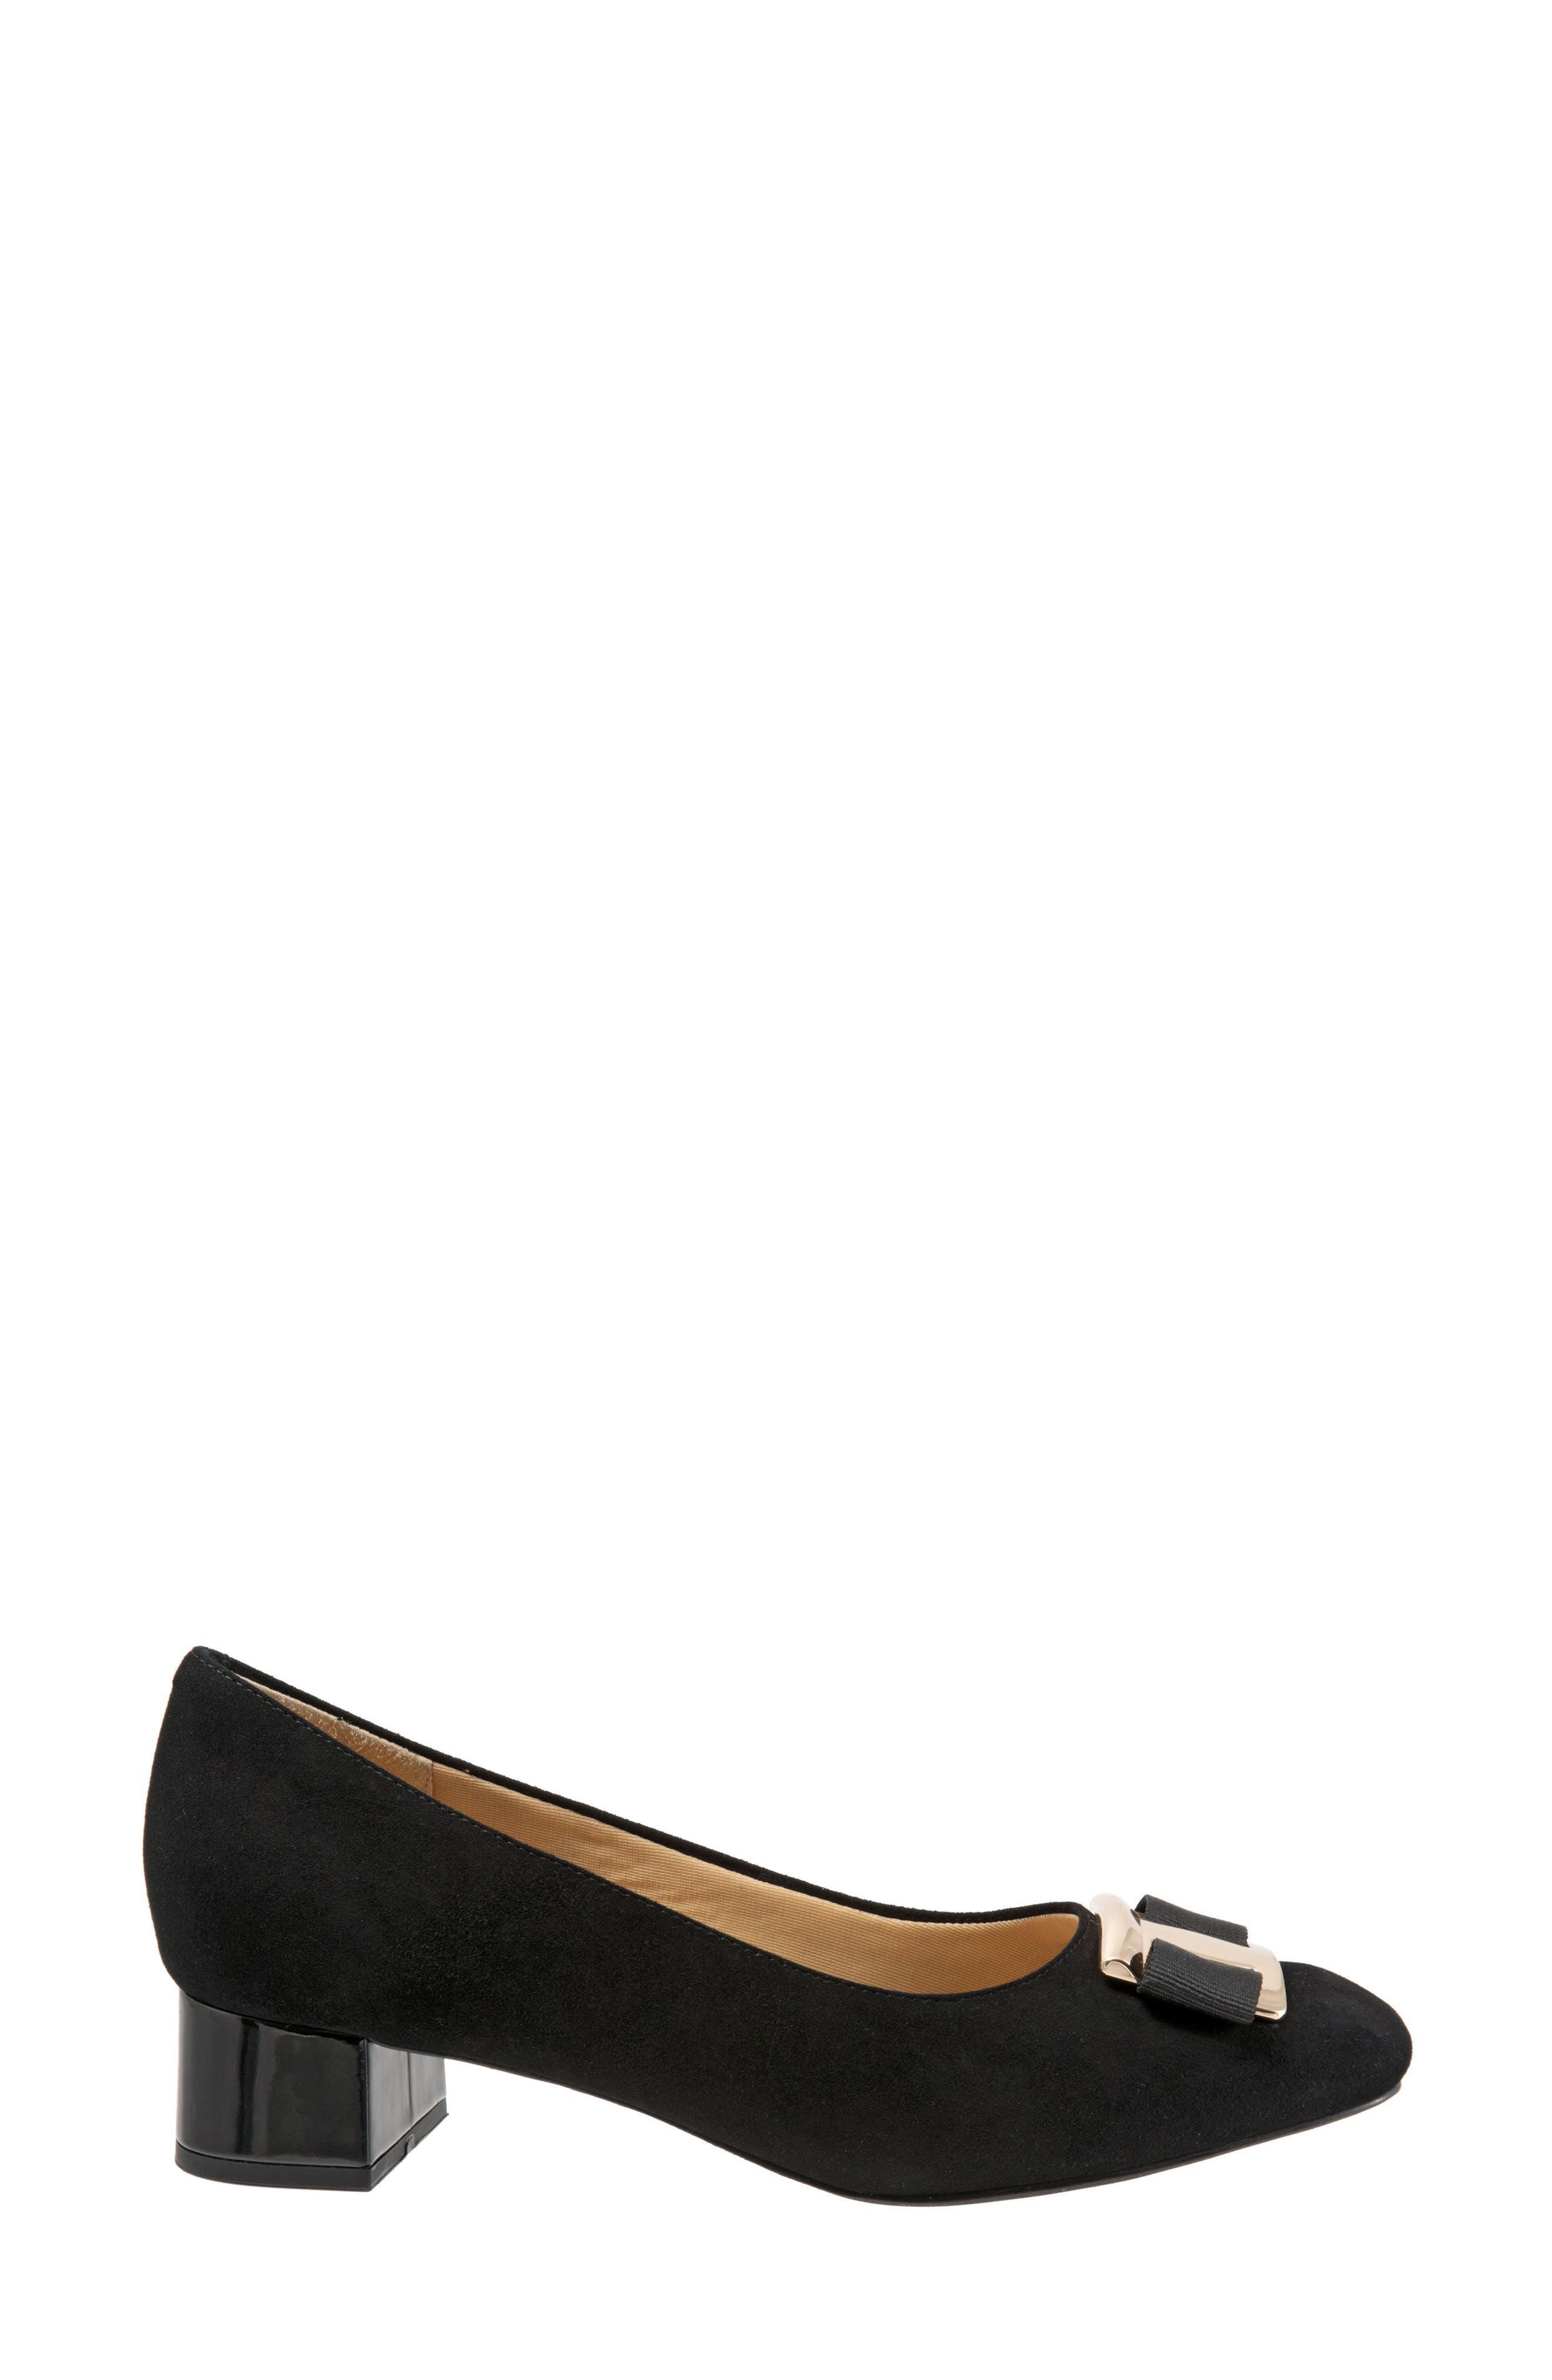 'Louise' Block Heel Pump,                             Alternate thumbnail 3, color,                             BLACK SUEDE